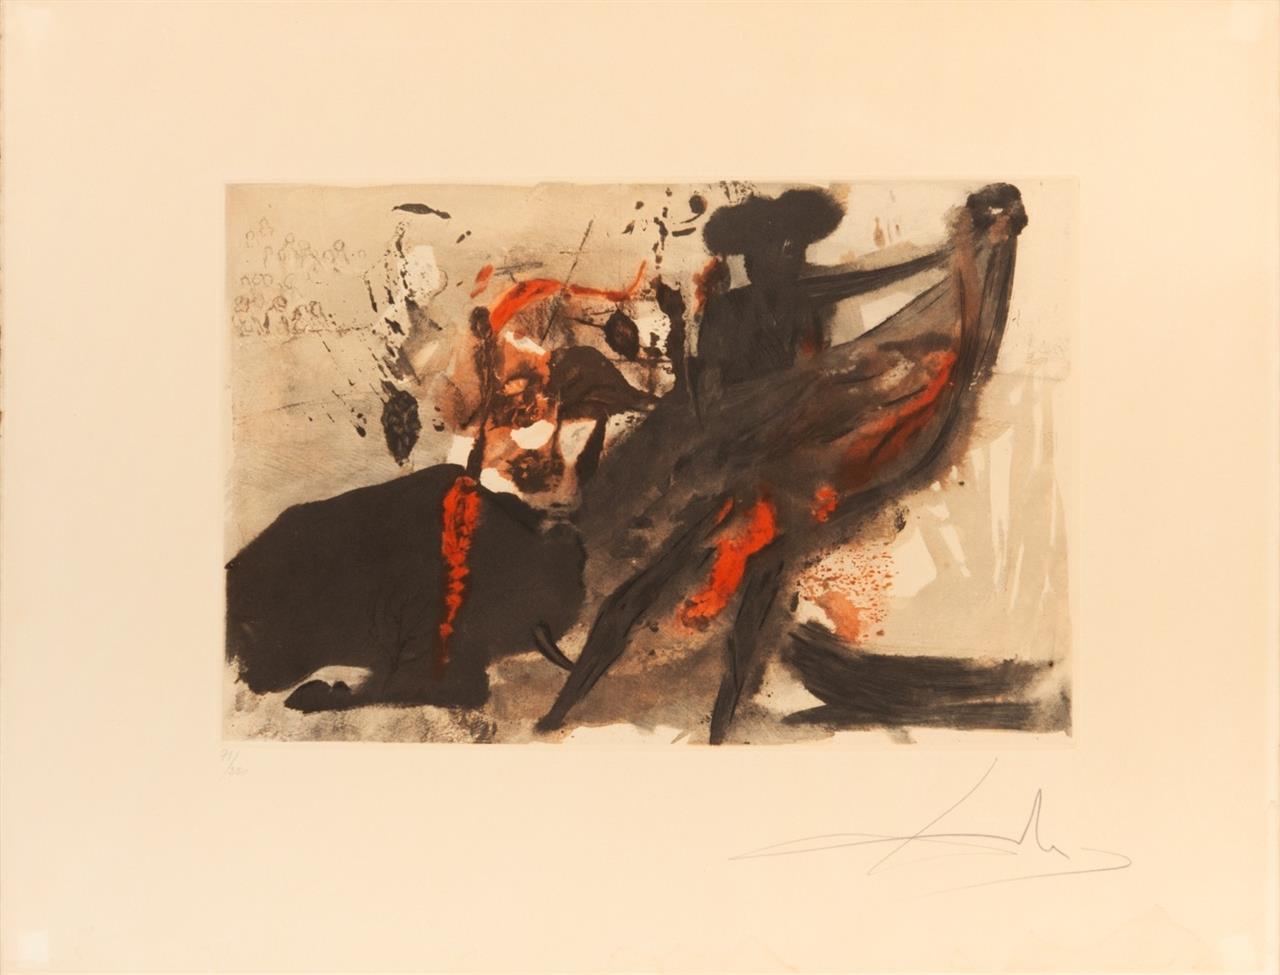 Salvador Dalí. La Tauromachie individuelle. 1966. Farbheliogravure mit Pochoir. Signiert. Ex. 71/250. ML 153b.